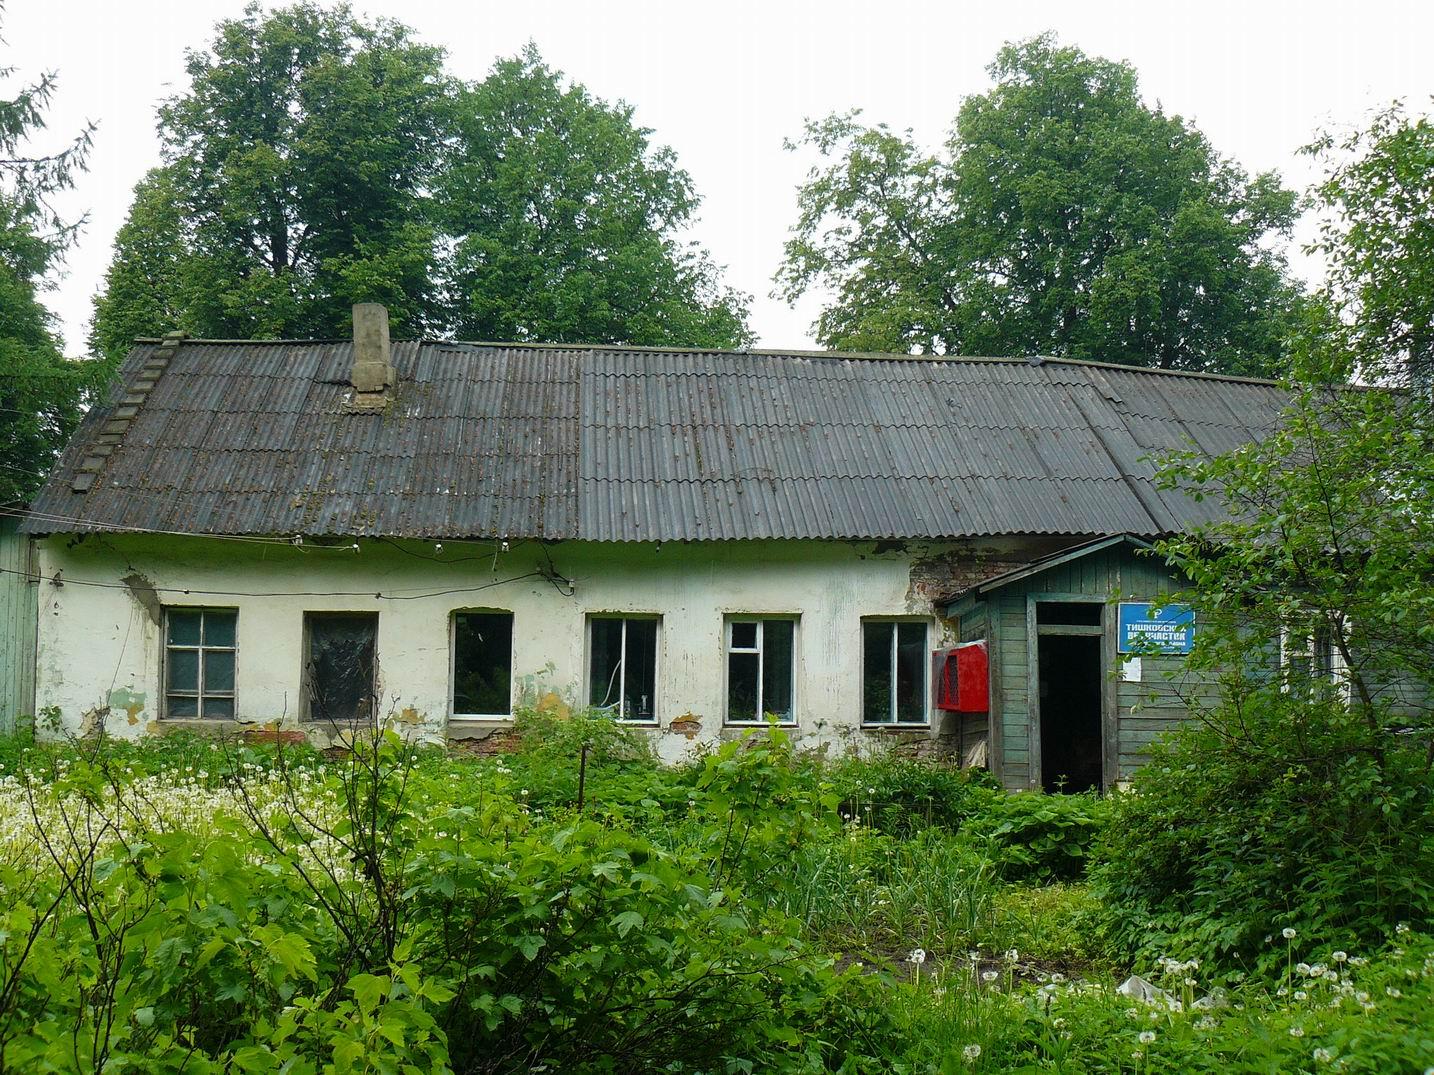 http://pics.livejournal.com/pushkino_2009/pic/000pcwca